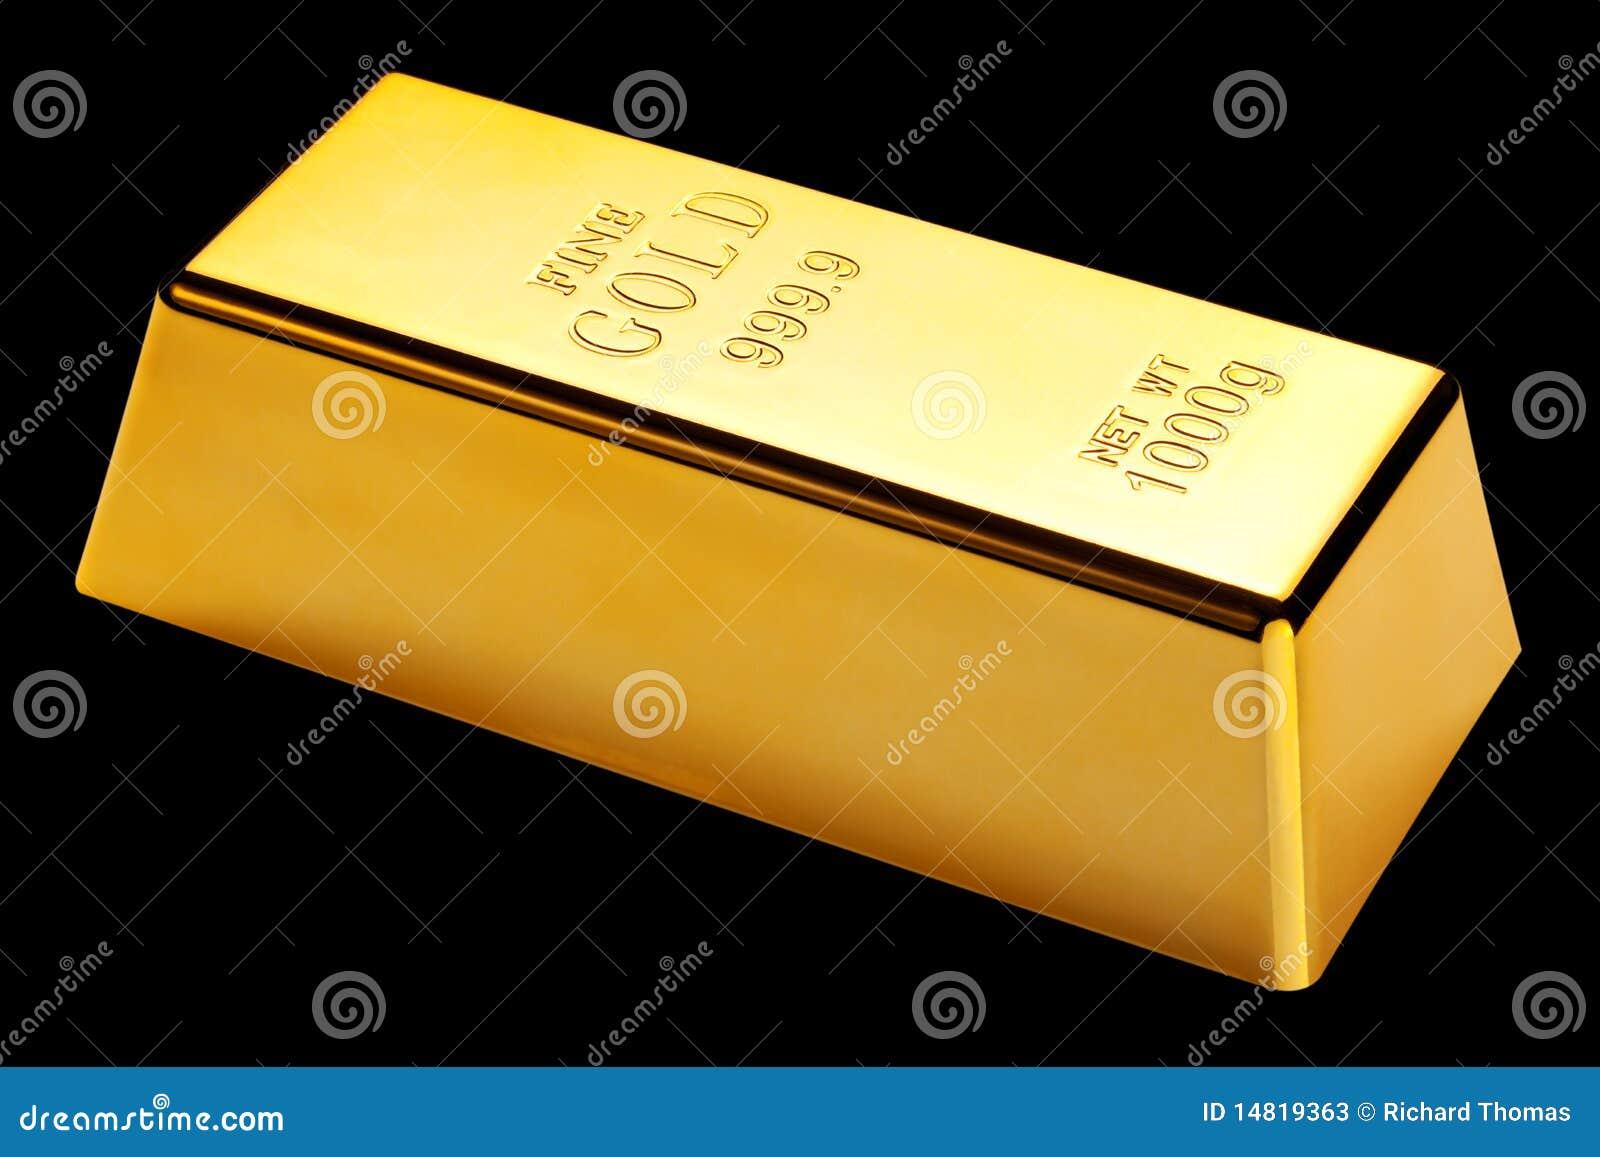 gold bar black background - photo #5